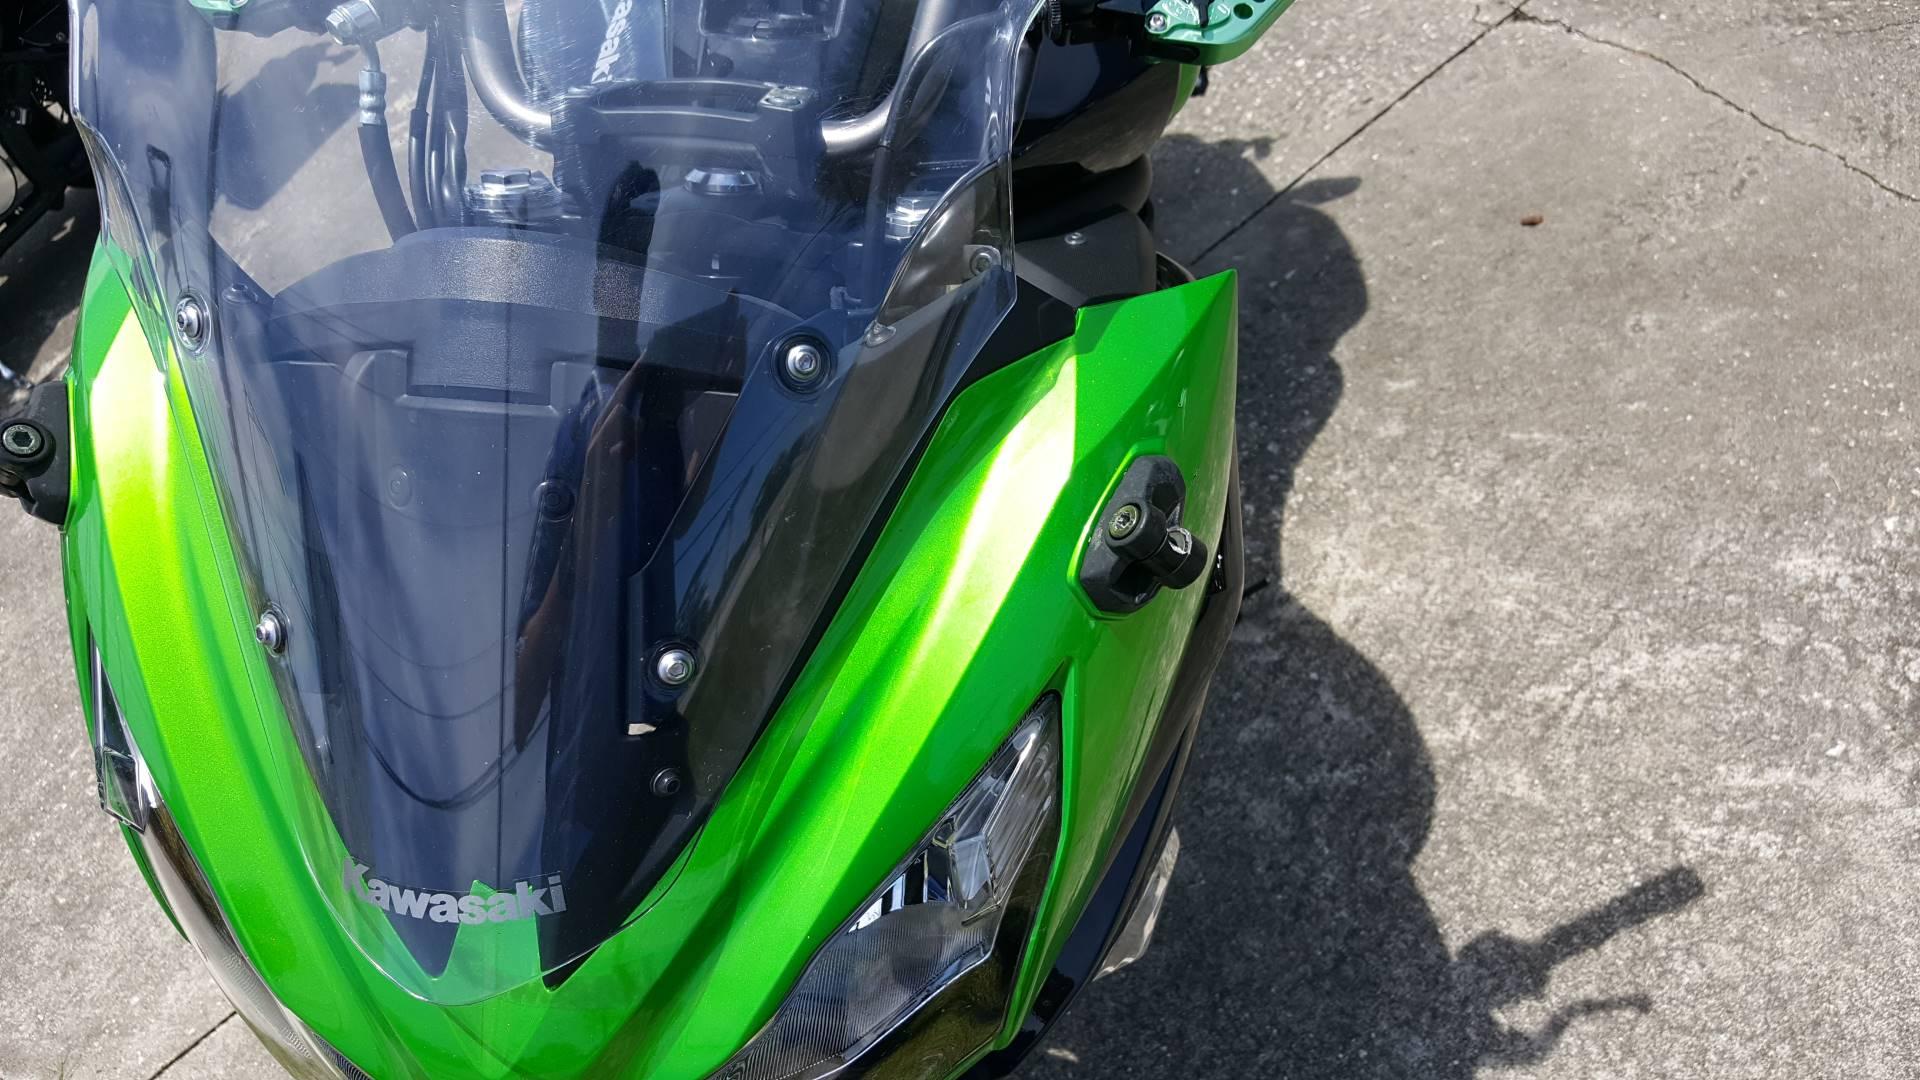 2016 Kawasaki Ninja 650 11